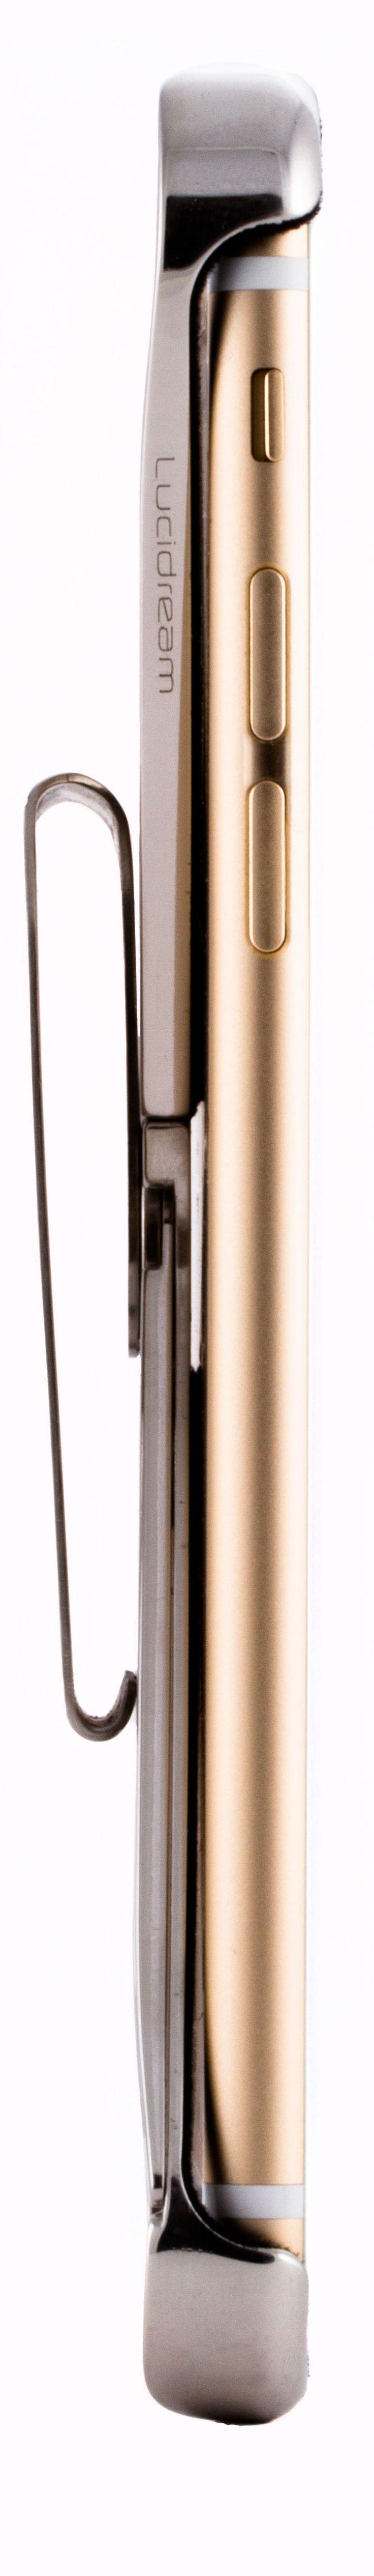 iPhone Case | Lucidream eXo Designed by Ramak Radmard